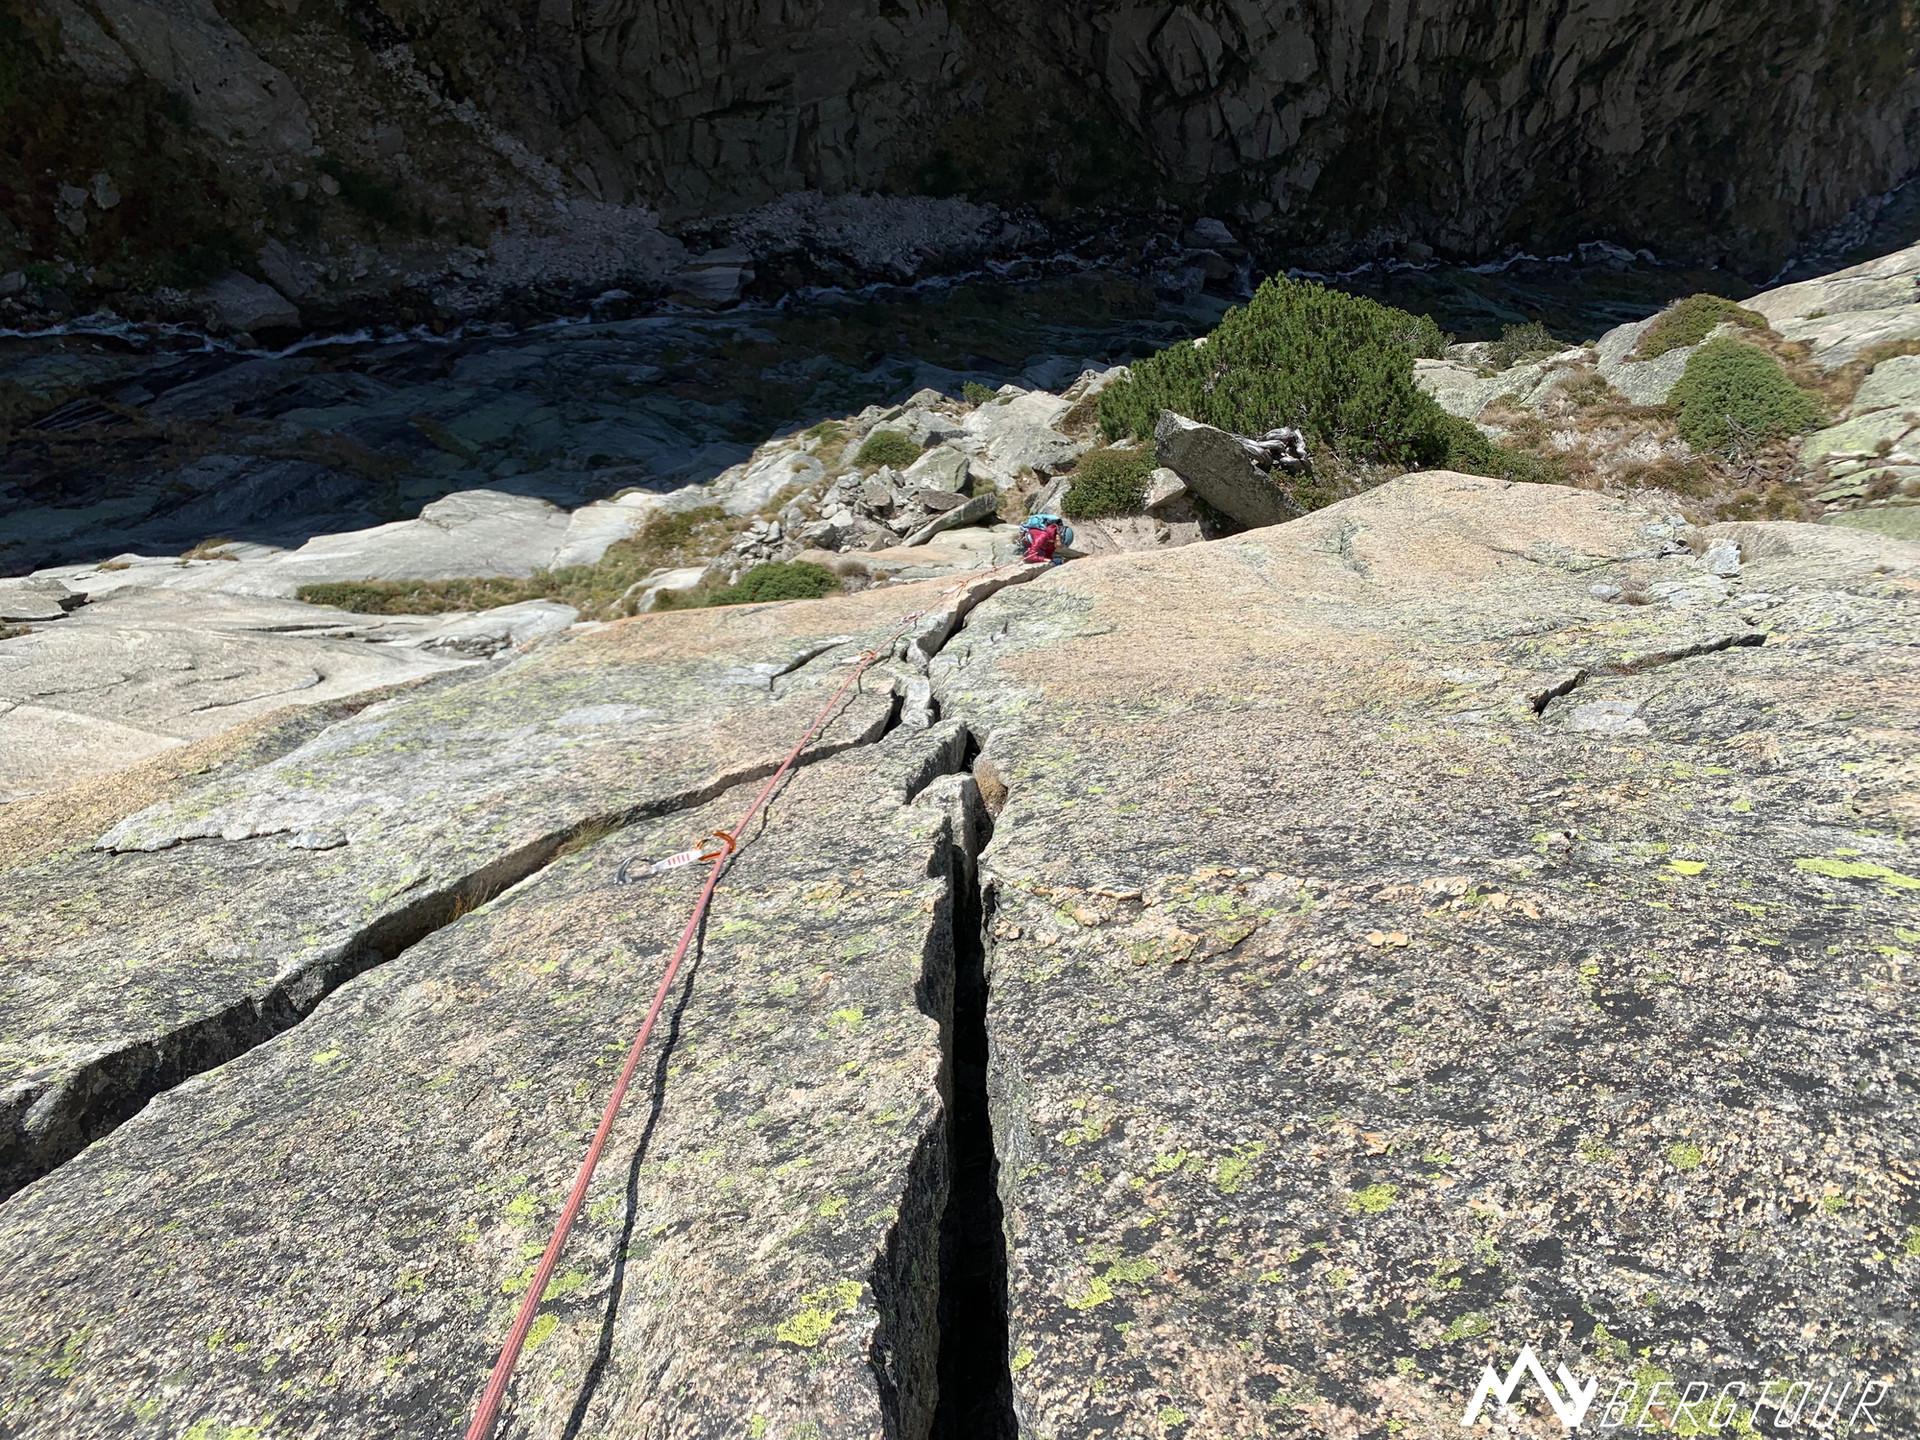 Teufelstalwand Klettern Im Zeichen der Freundschaft mybergtour Riss